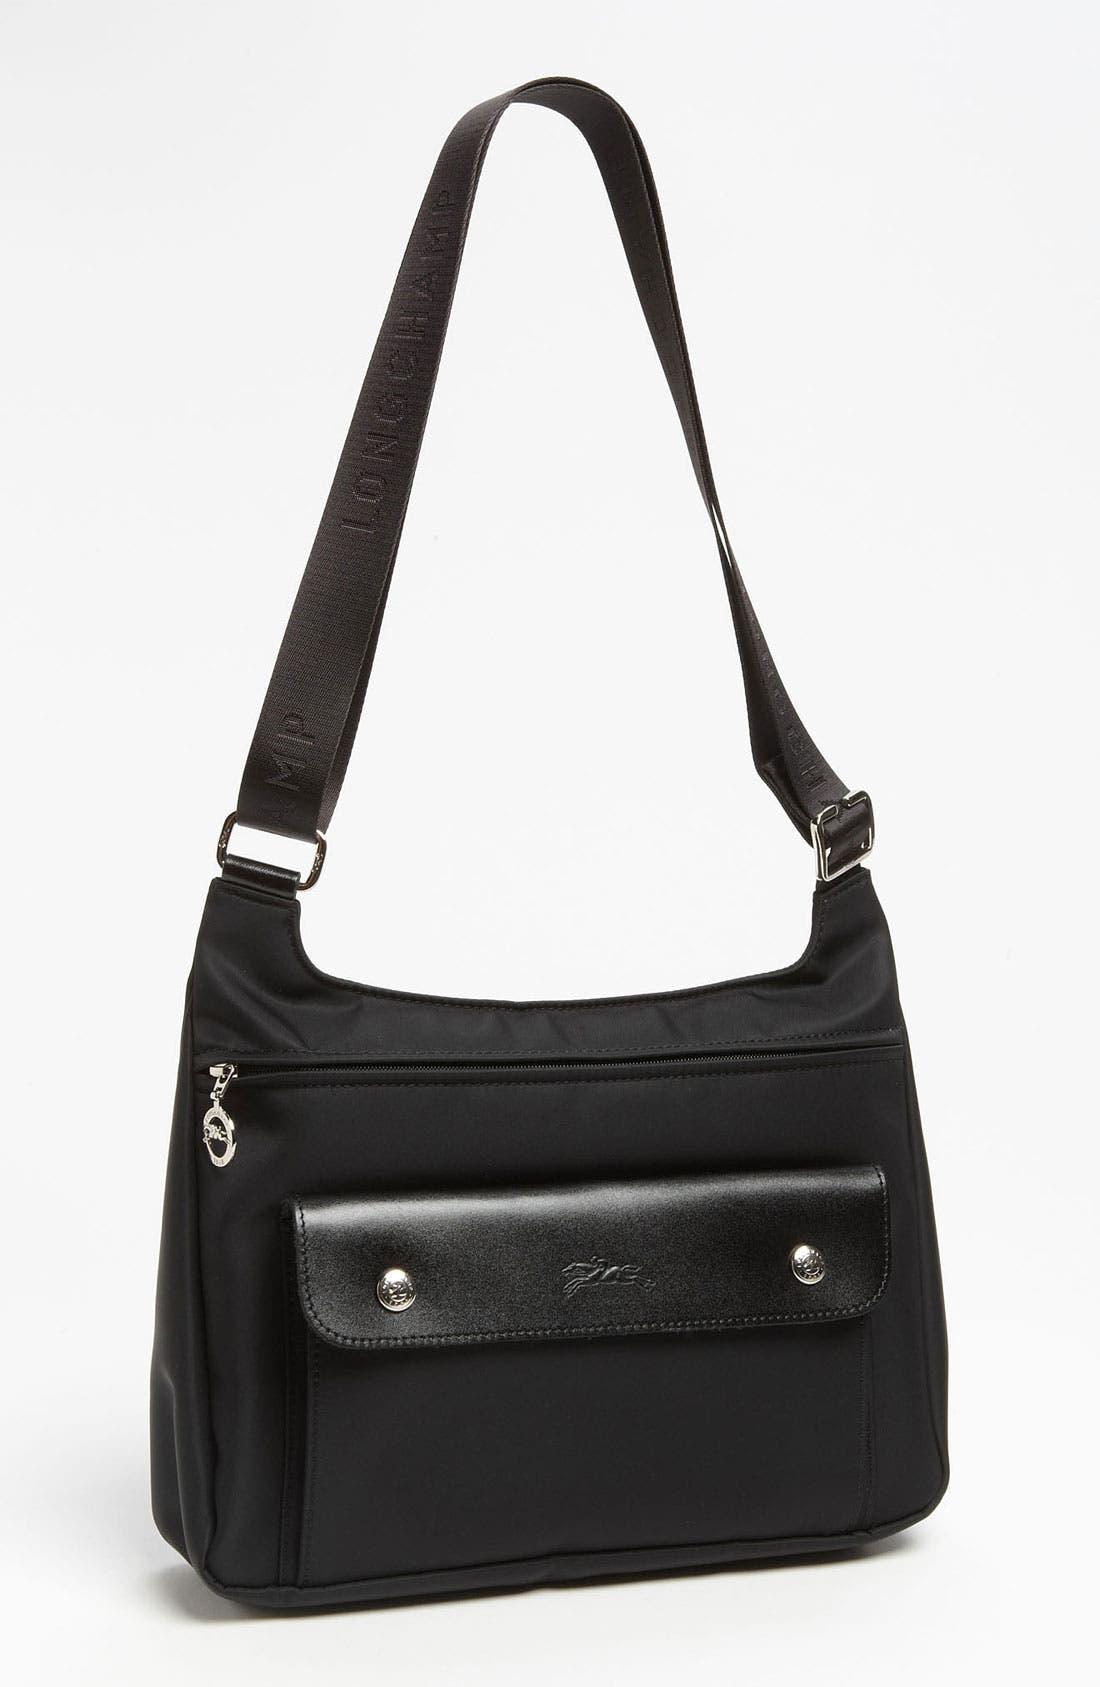 Alternate Image 1 Selected - Longchamp 'Planetes' Crossbody Bag